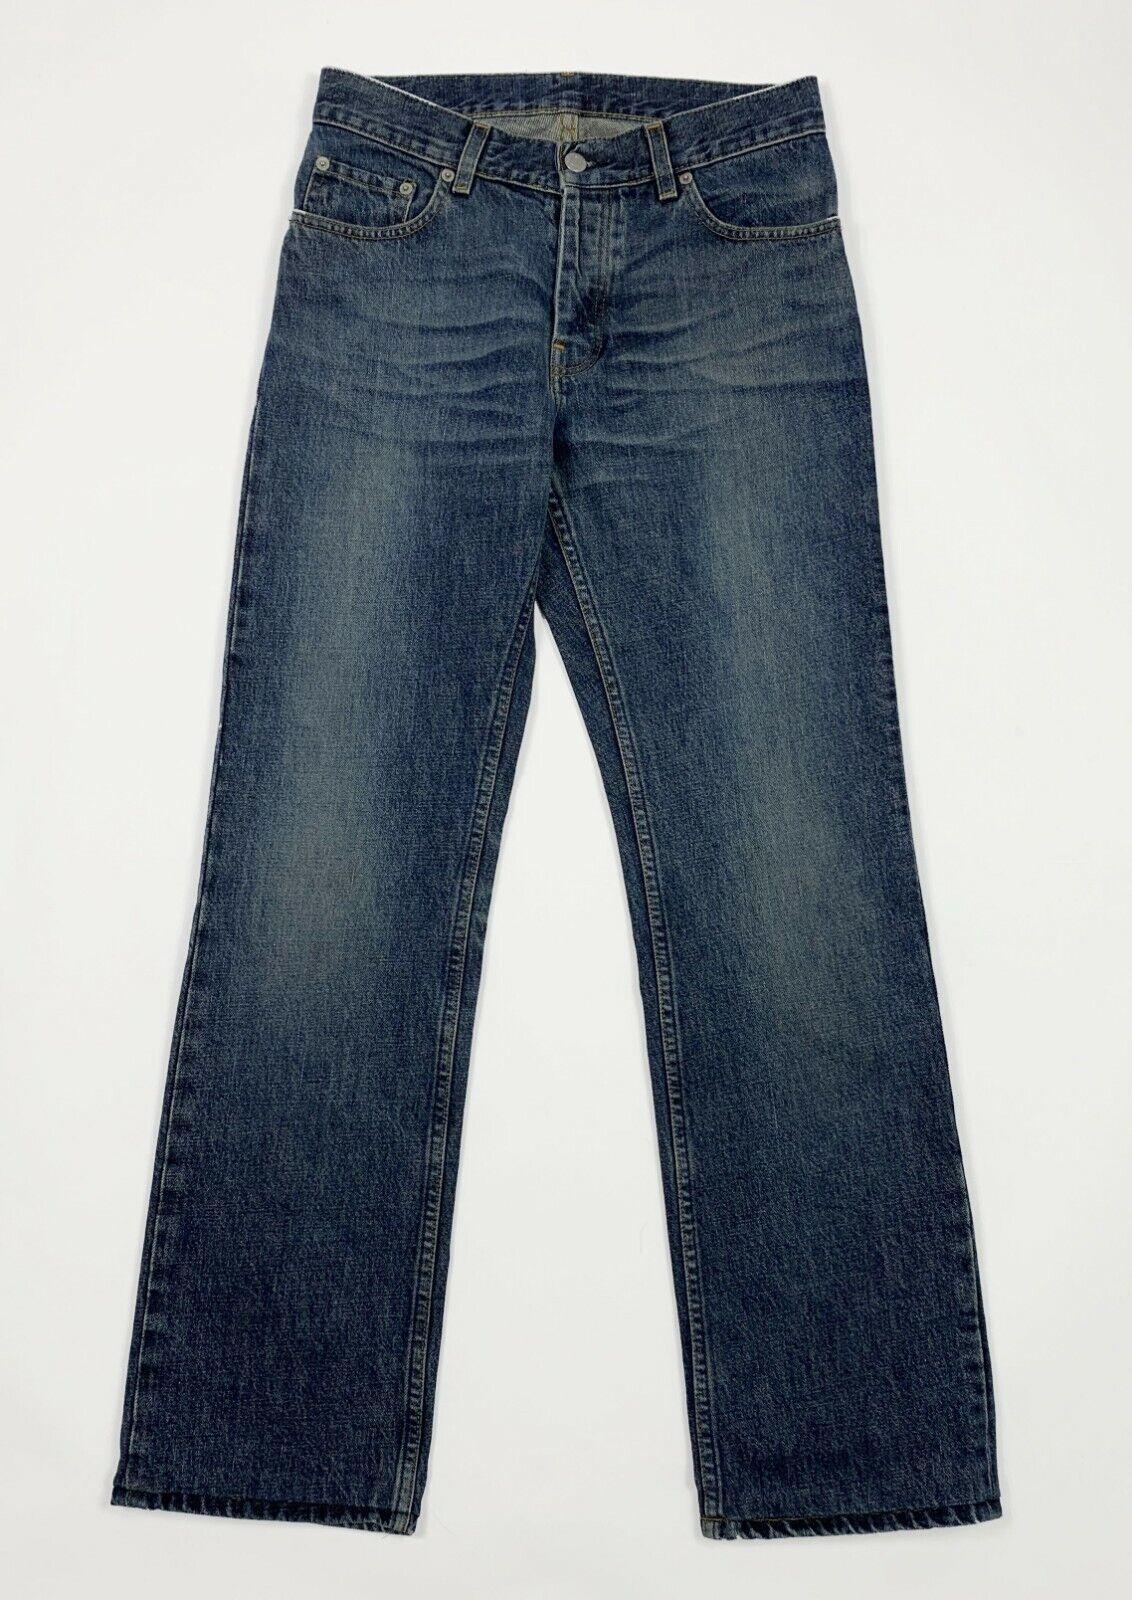 Helmut LANG JEANS ladies used w29 TG 43 Straight Leg Classic Denim Vintage t5324